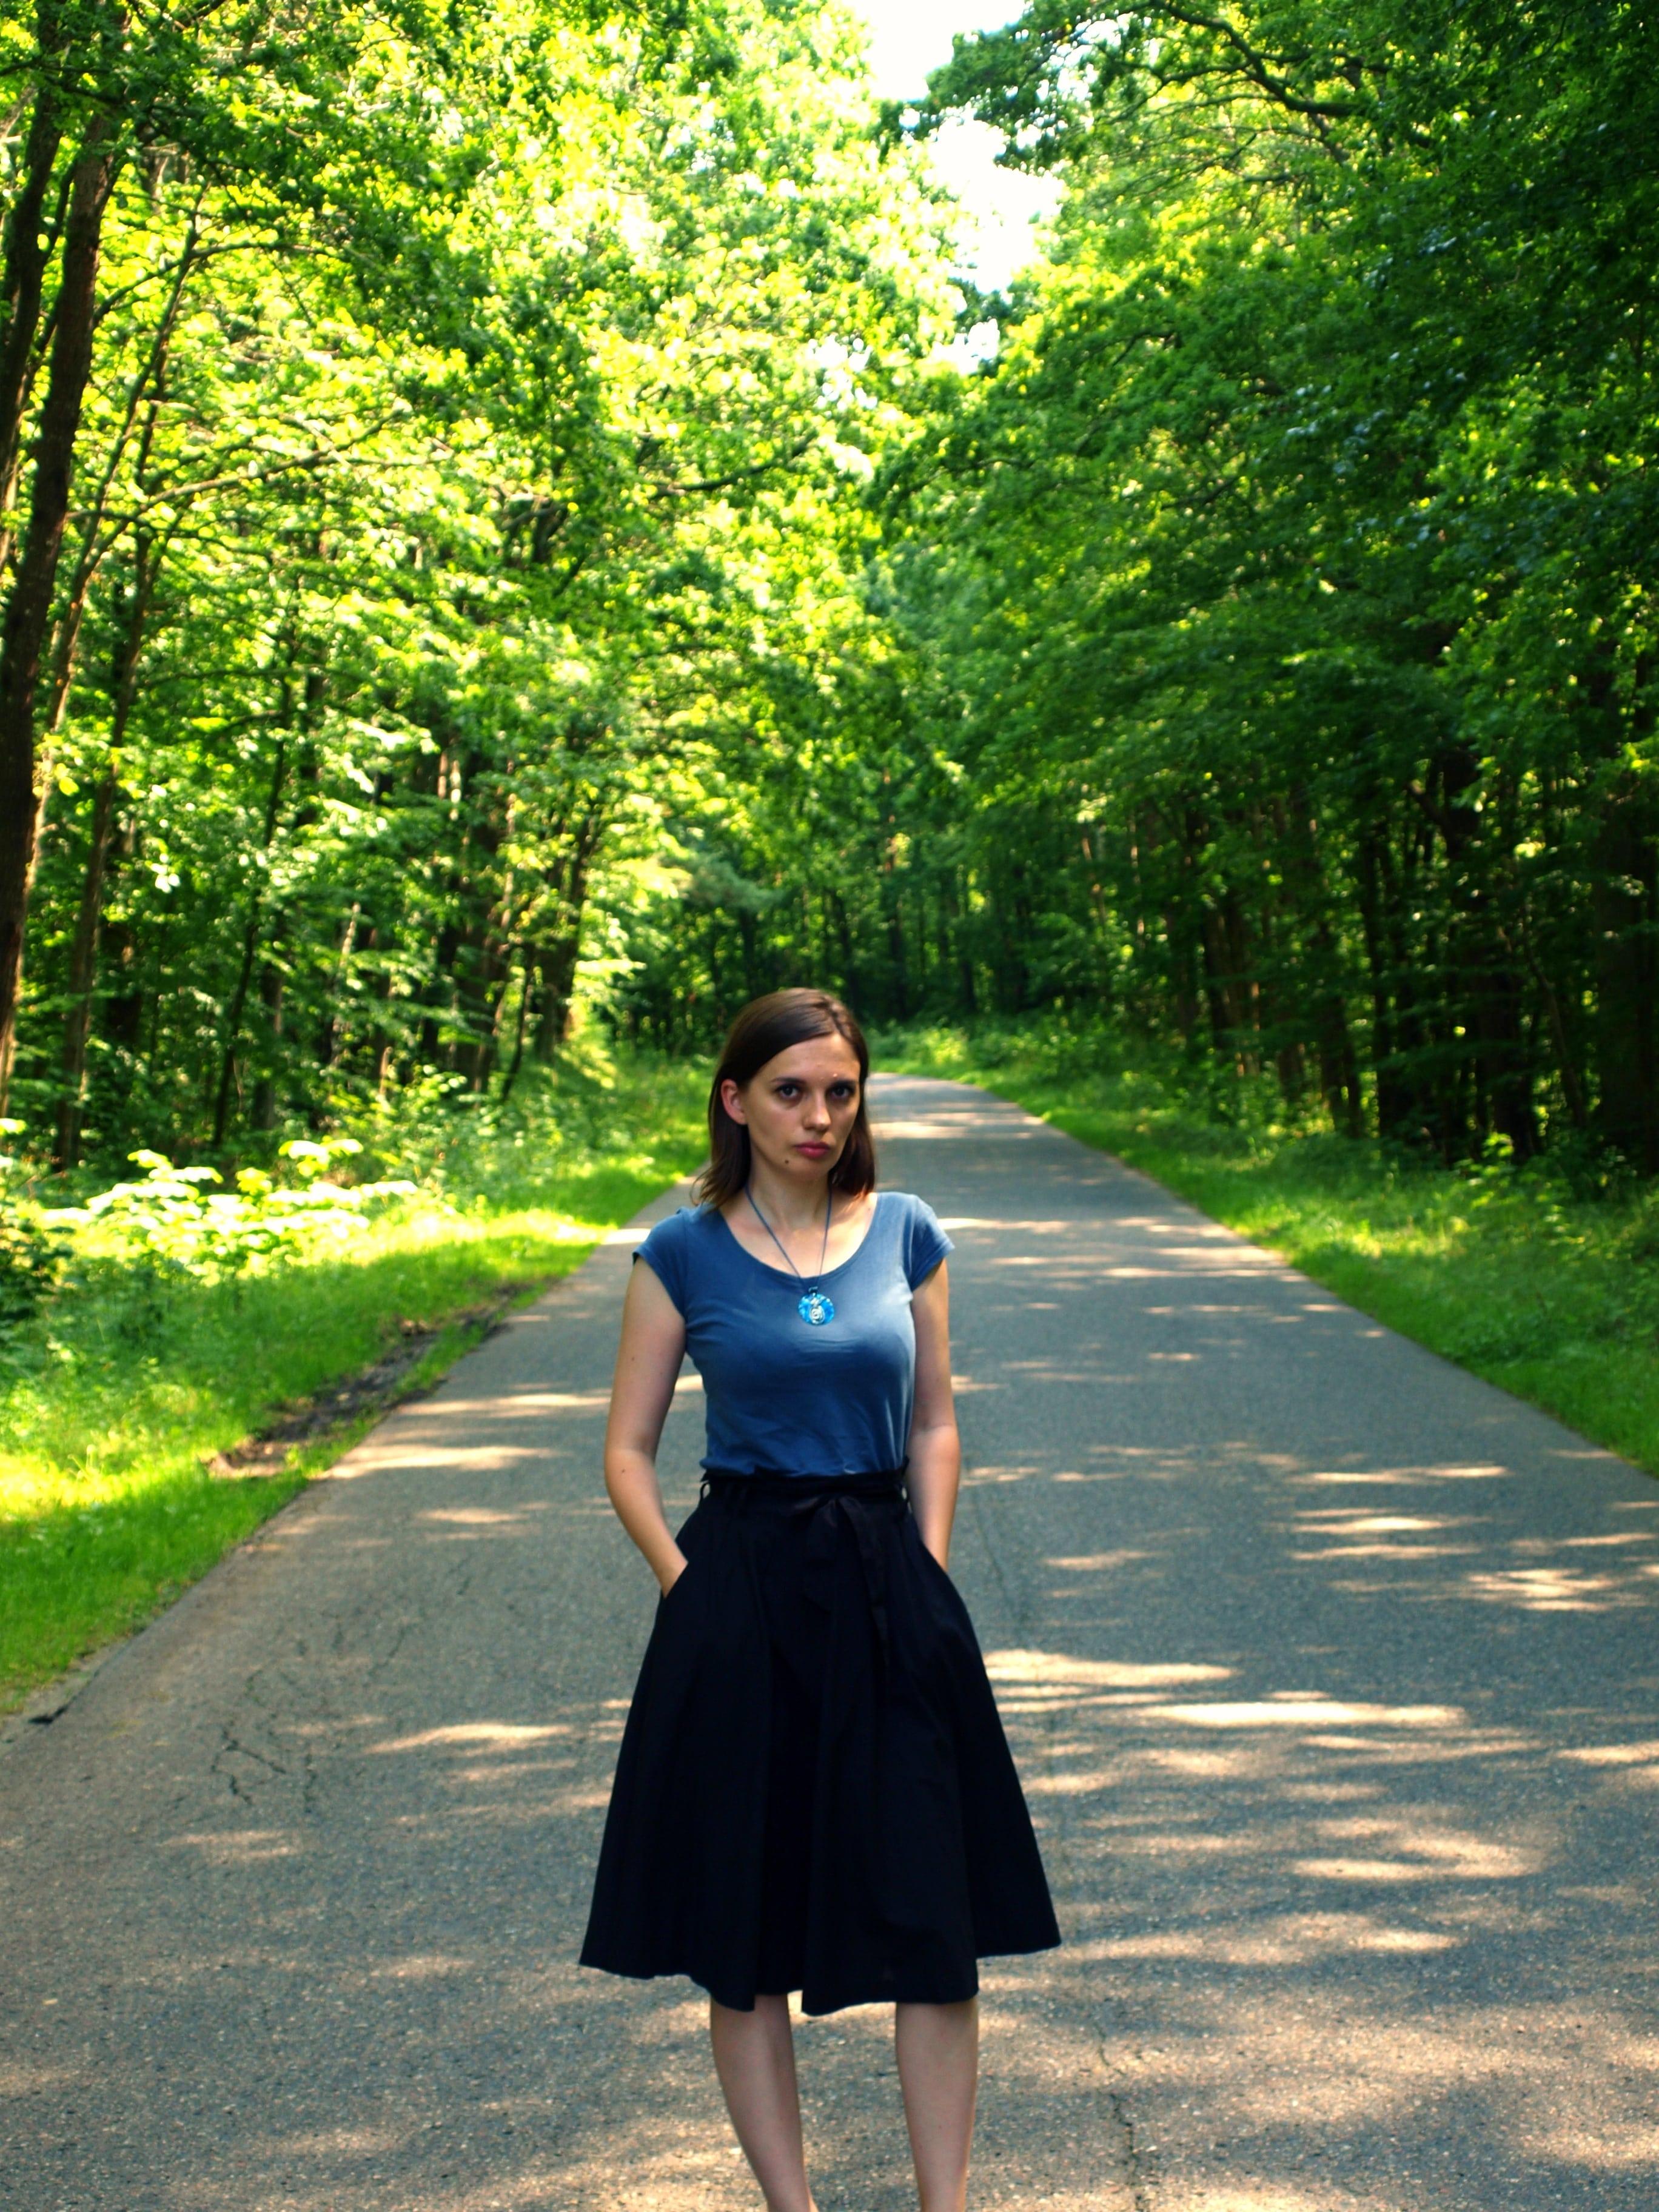 niebieska koszulka i czarna spódnica